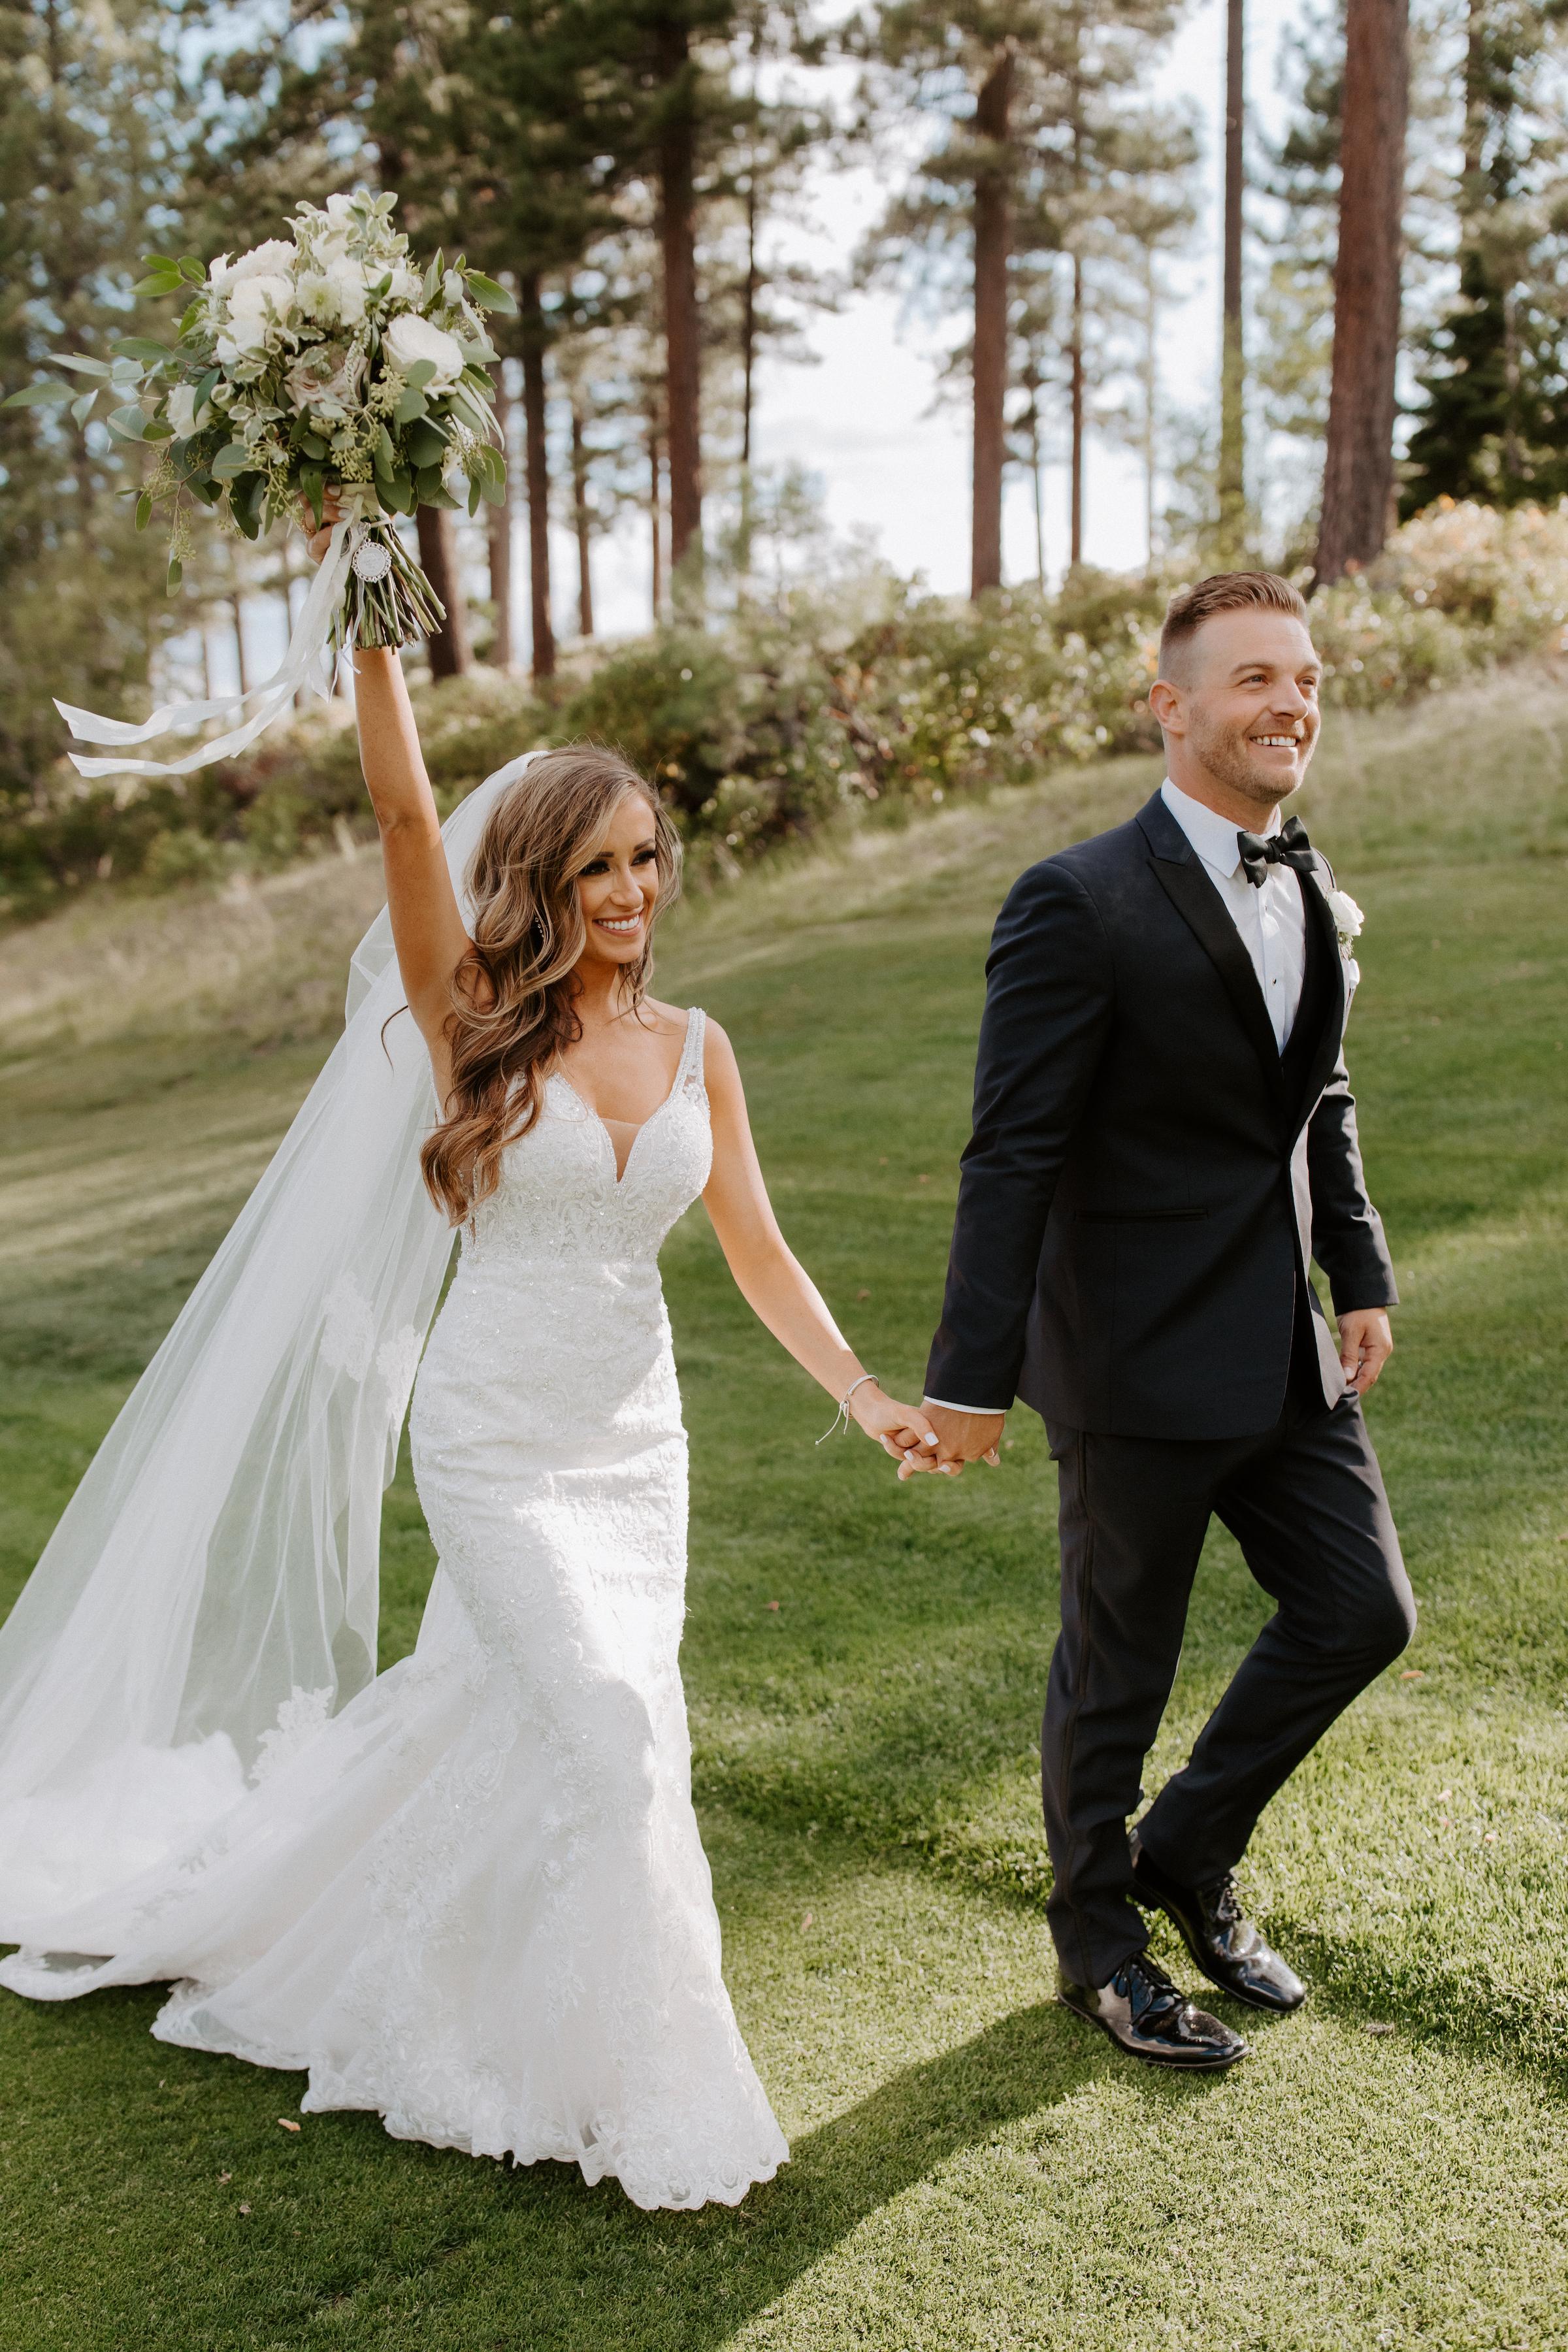 Neutral Toned Timeless Lake Tahoe Wedding Kay Kroshus16